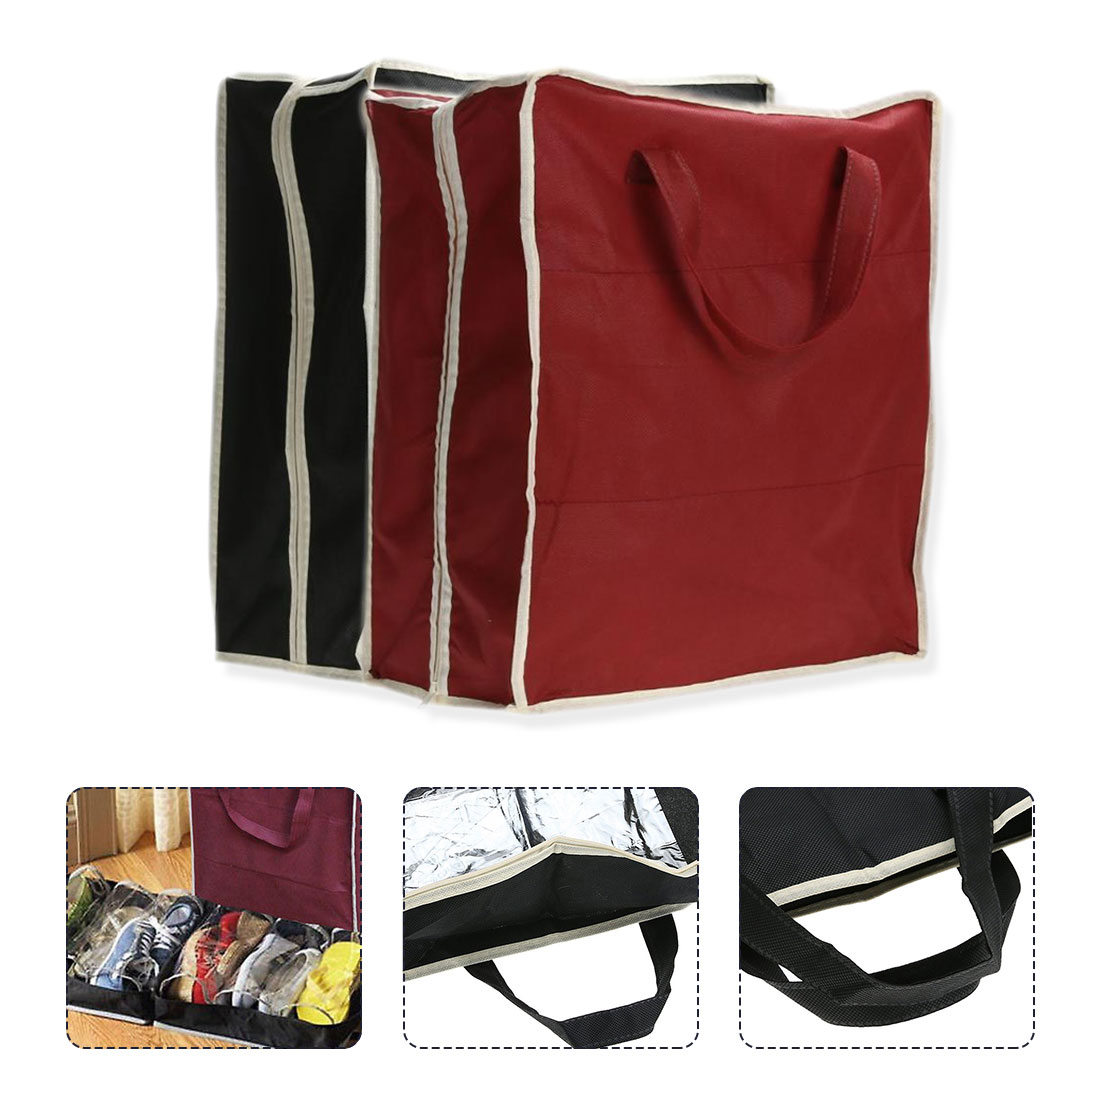 Flash Drives Power Bank Mouse BUBM 4Pc Electronic Travel Case Bag Set -Cables